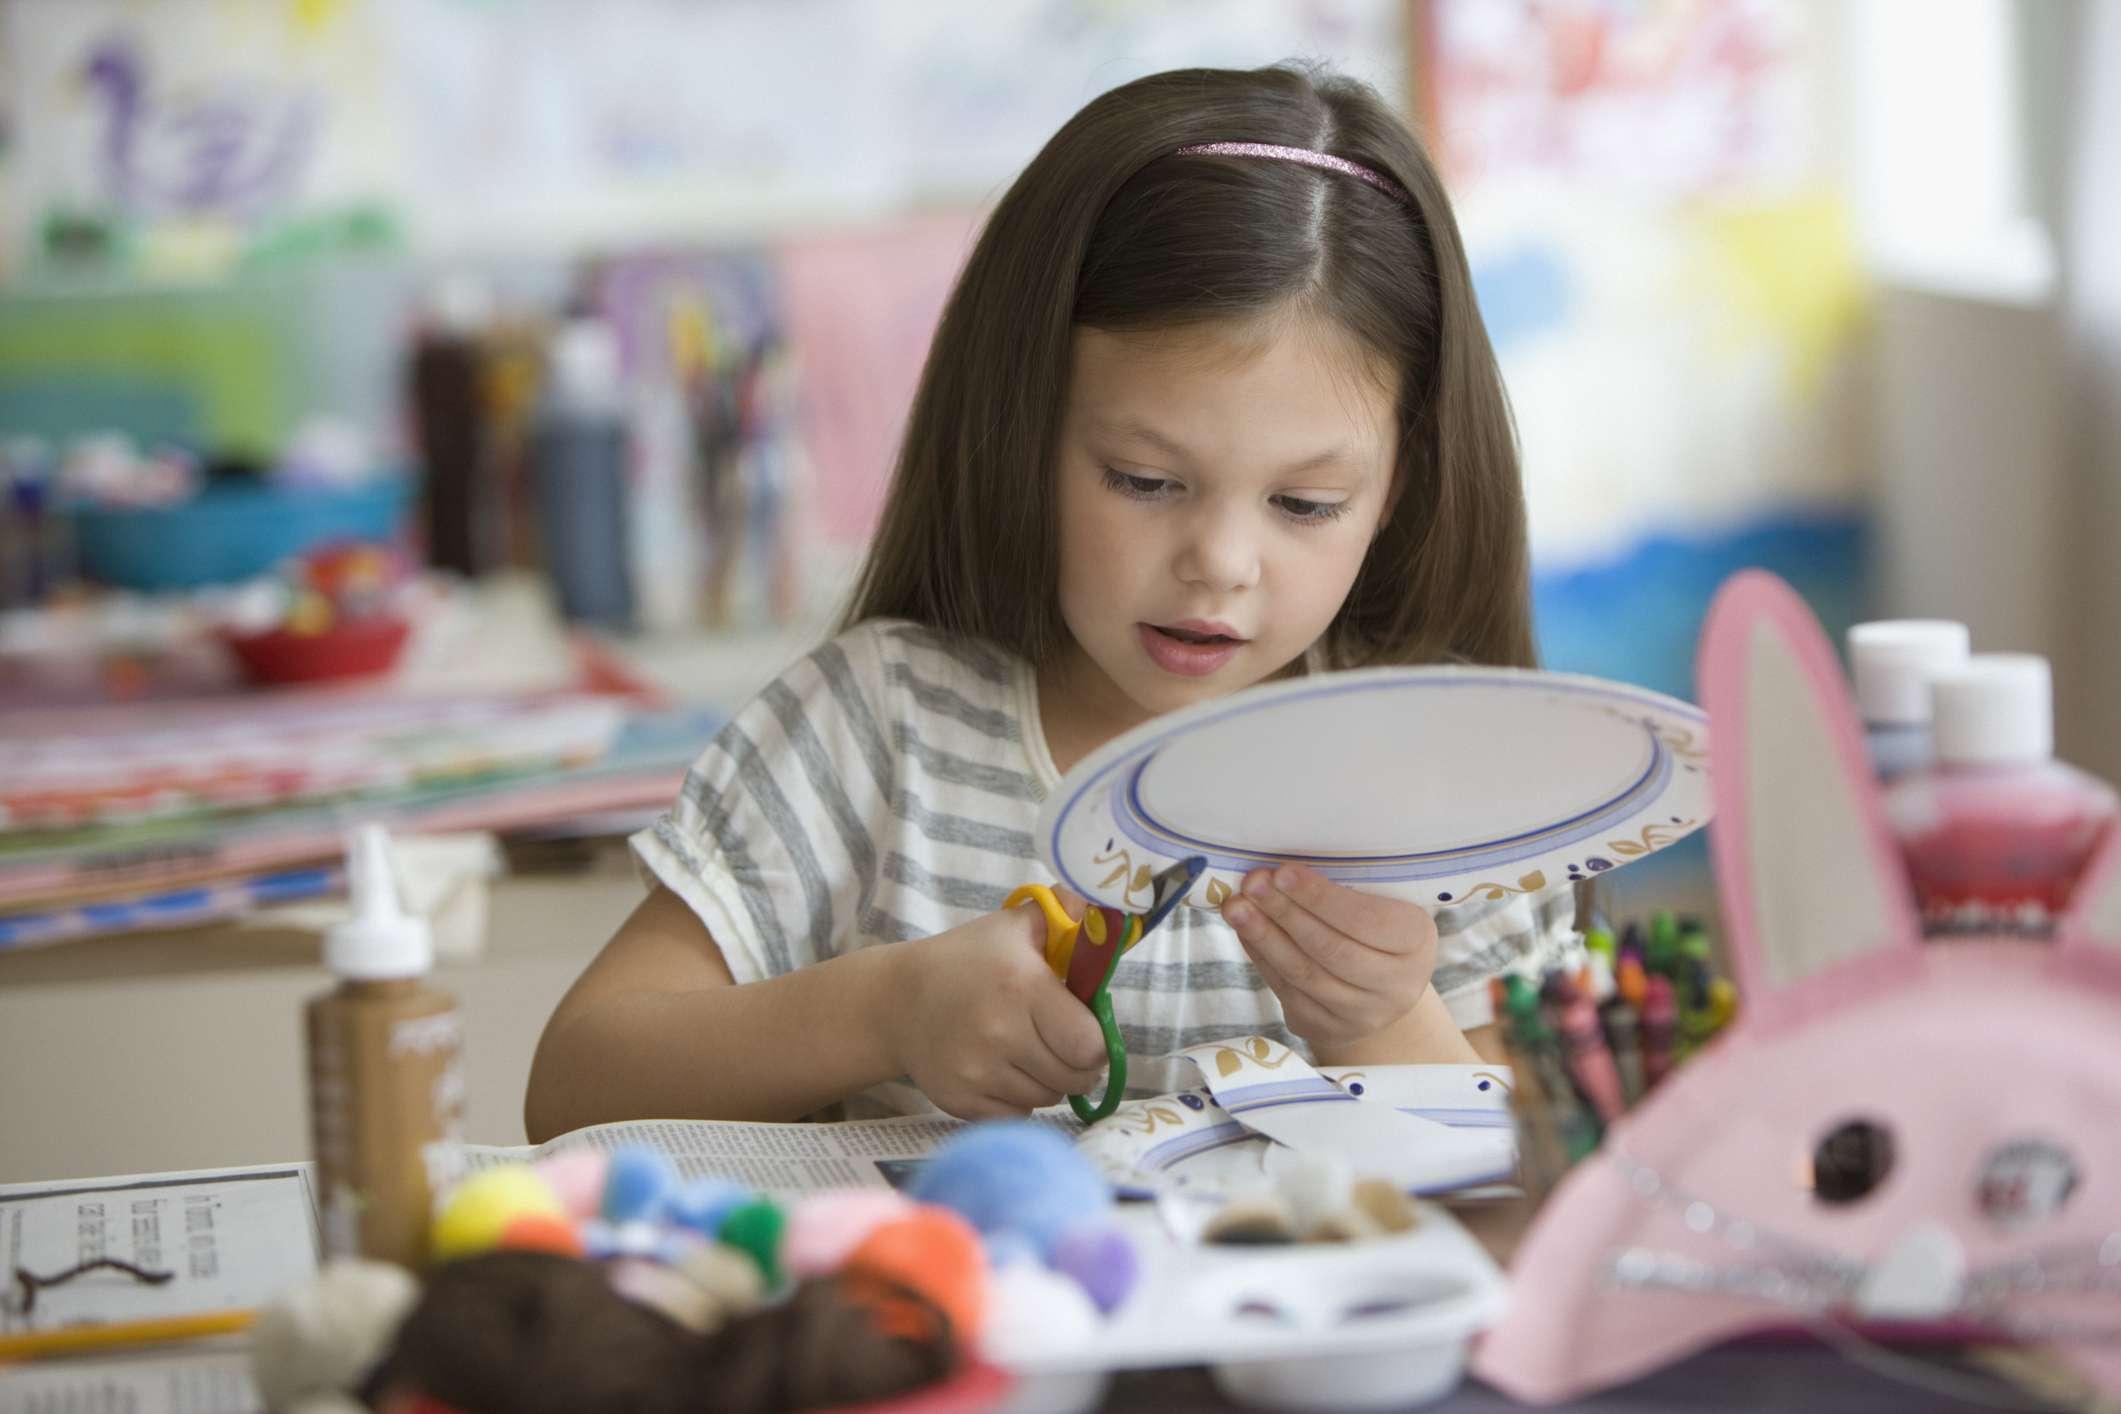 Caucasian girl cutting paper plate with scissors